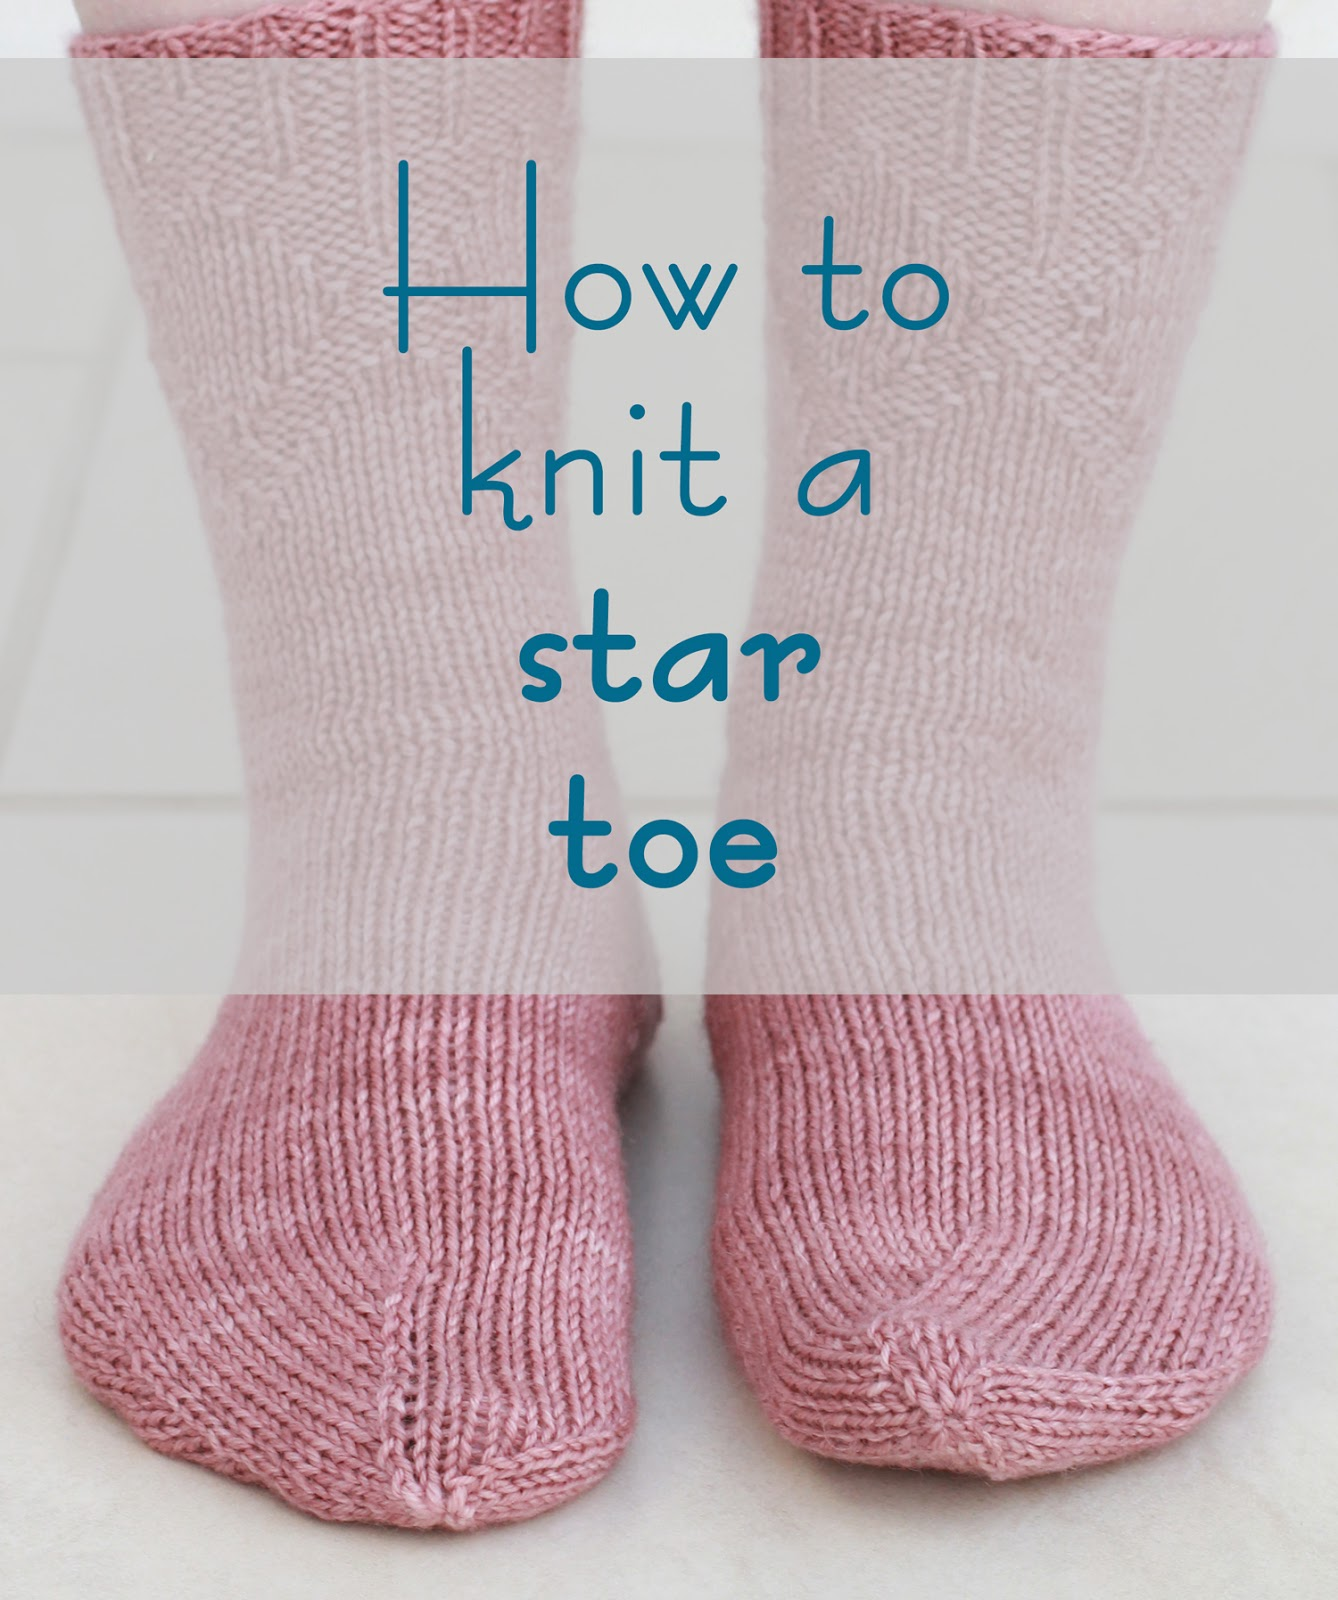 Katya Frankel: How to Shape a Star Toe - Sock Knitting